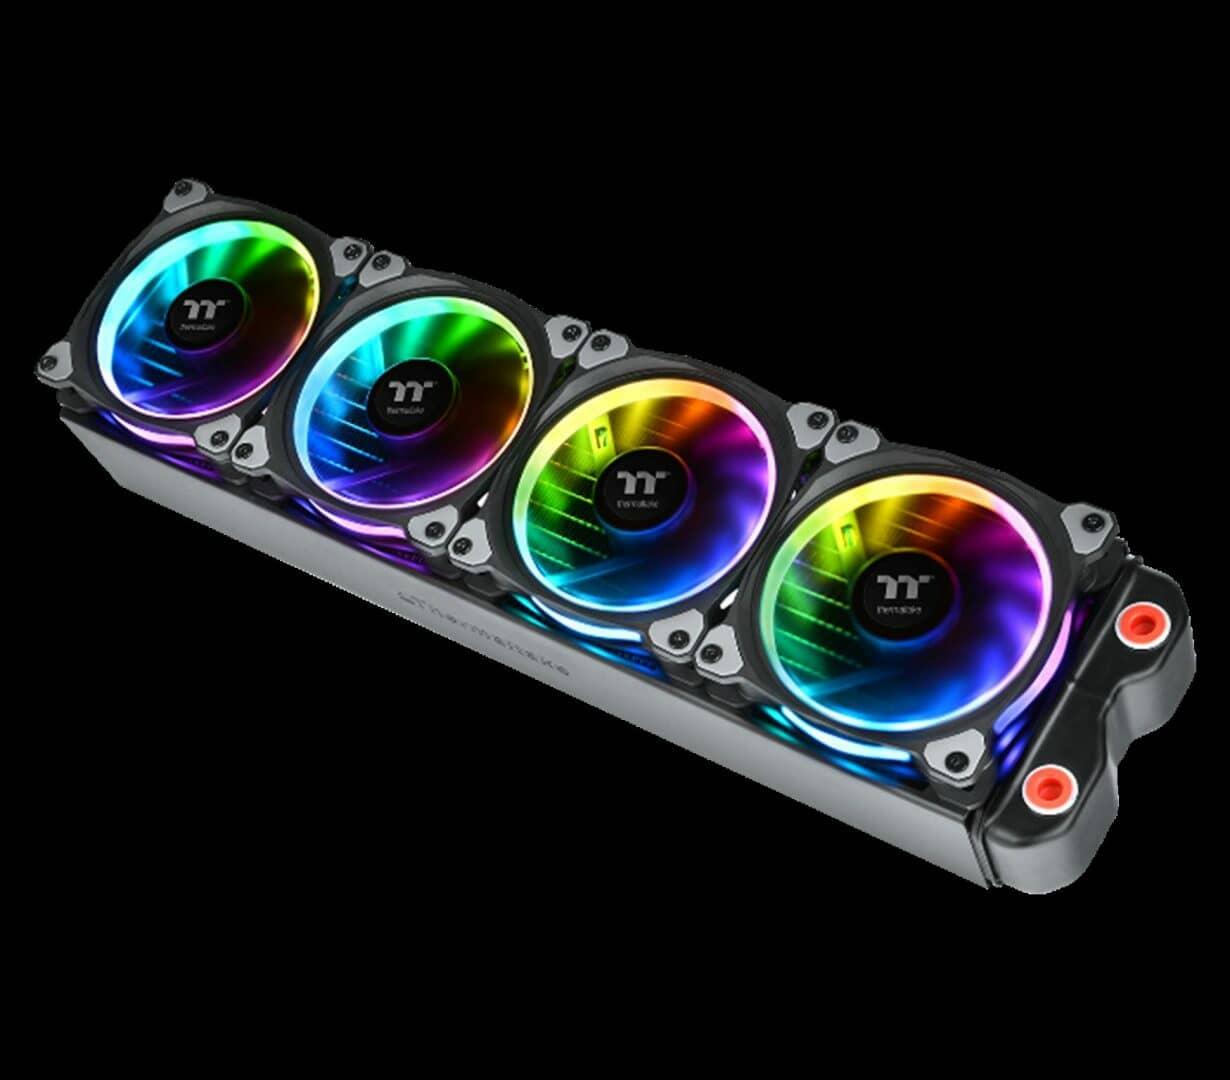 Thermaltake New Riing Plus 12 LED RGB Radiator Fan